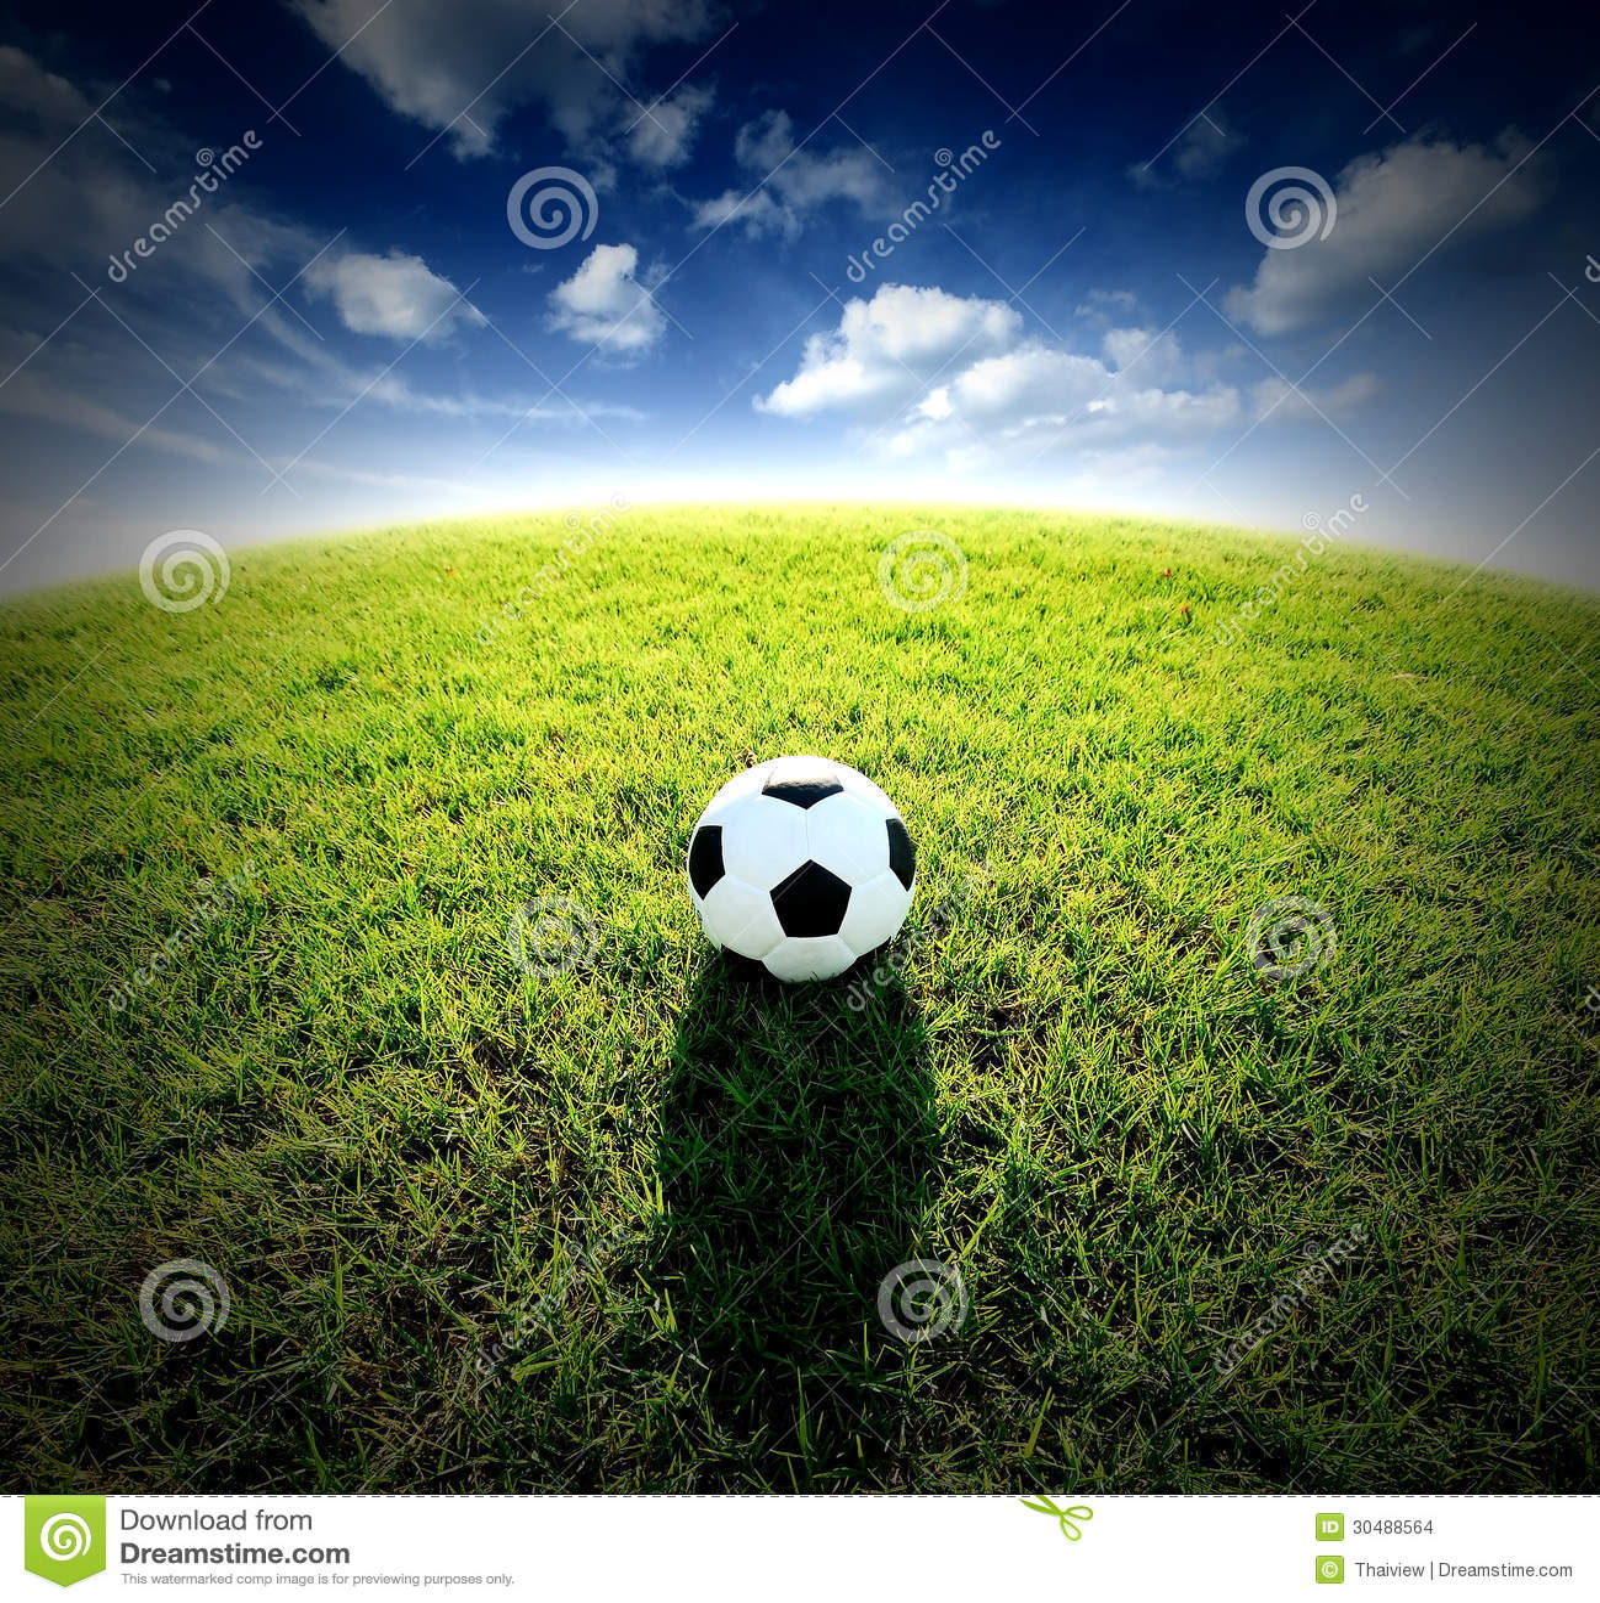 Stadium And Soccer Football On Green Grass Field Royalty ...